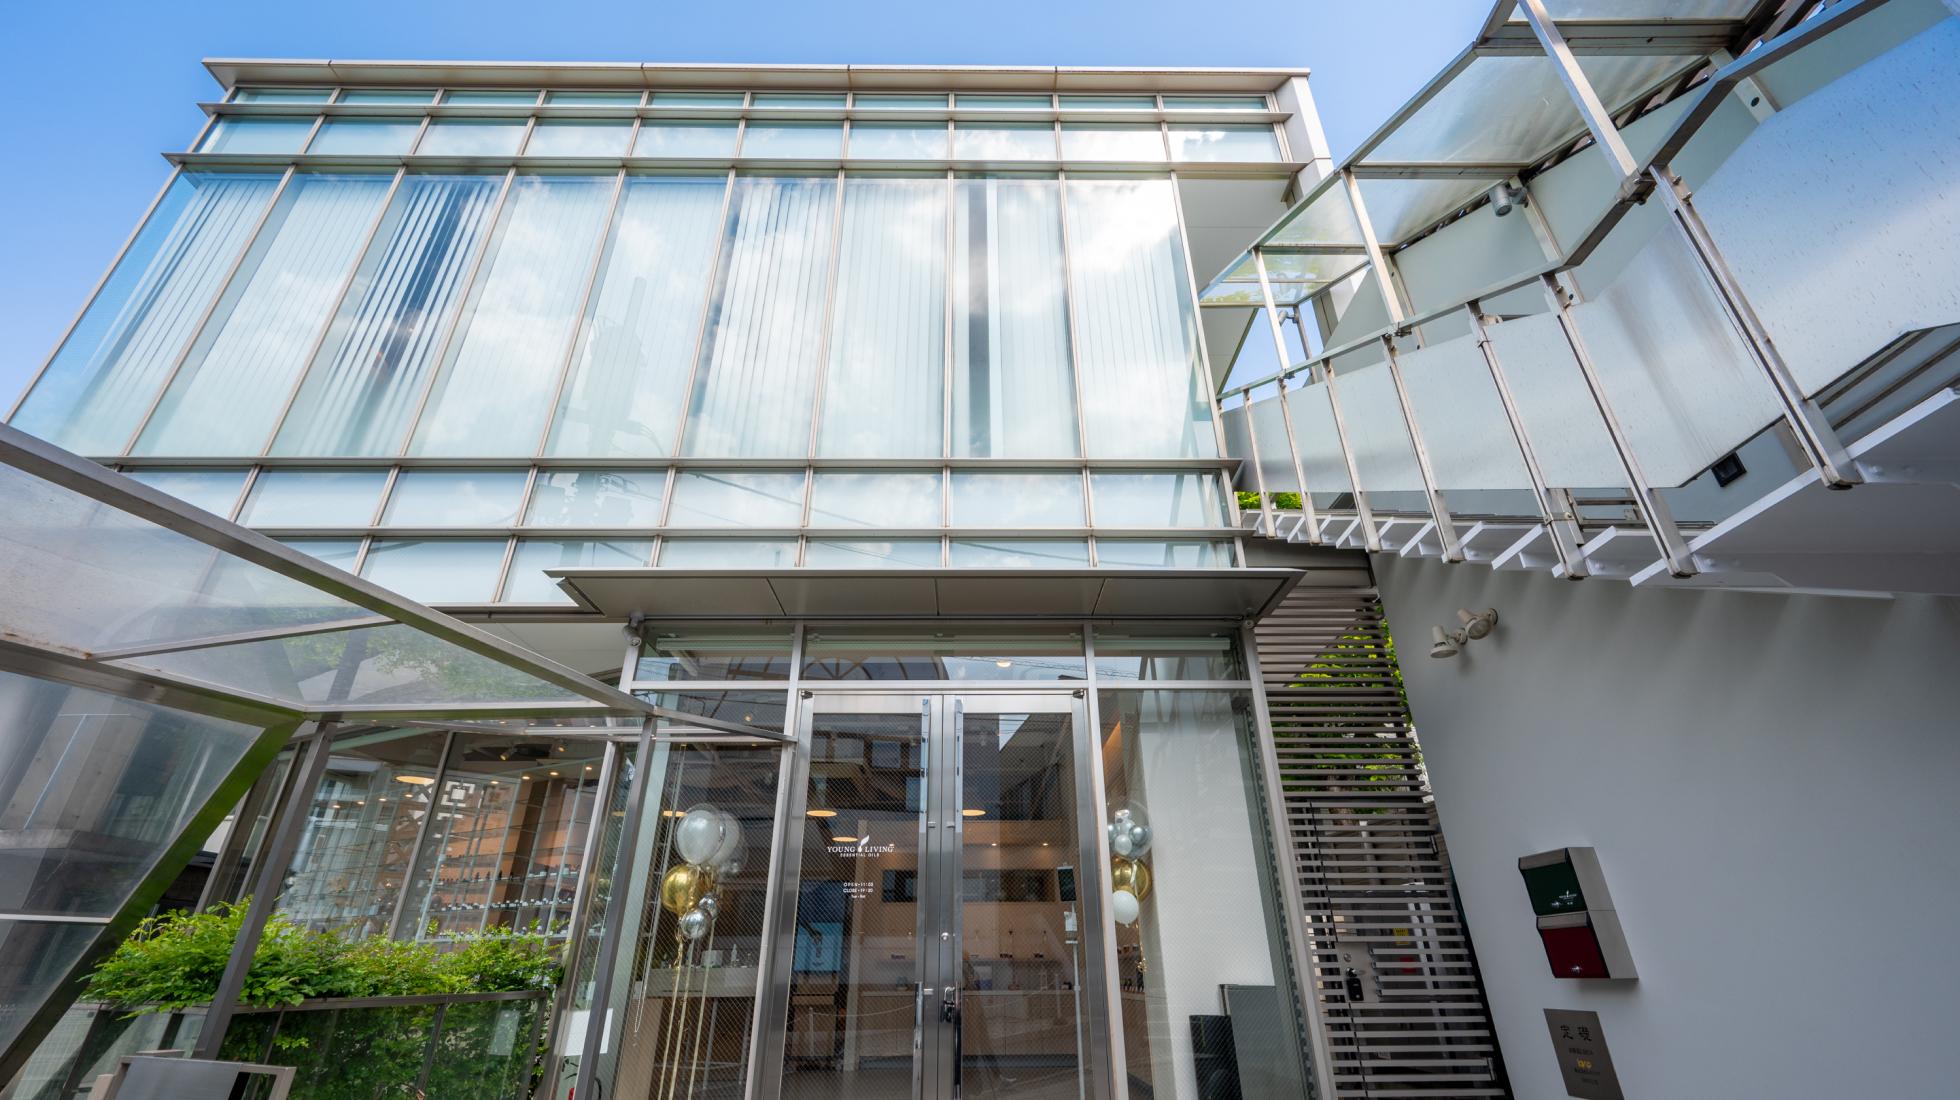 Youngliving Japan Omotesando Experience Center